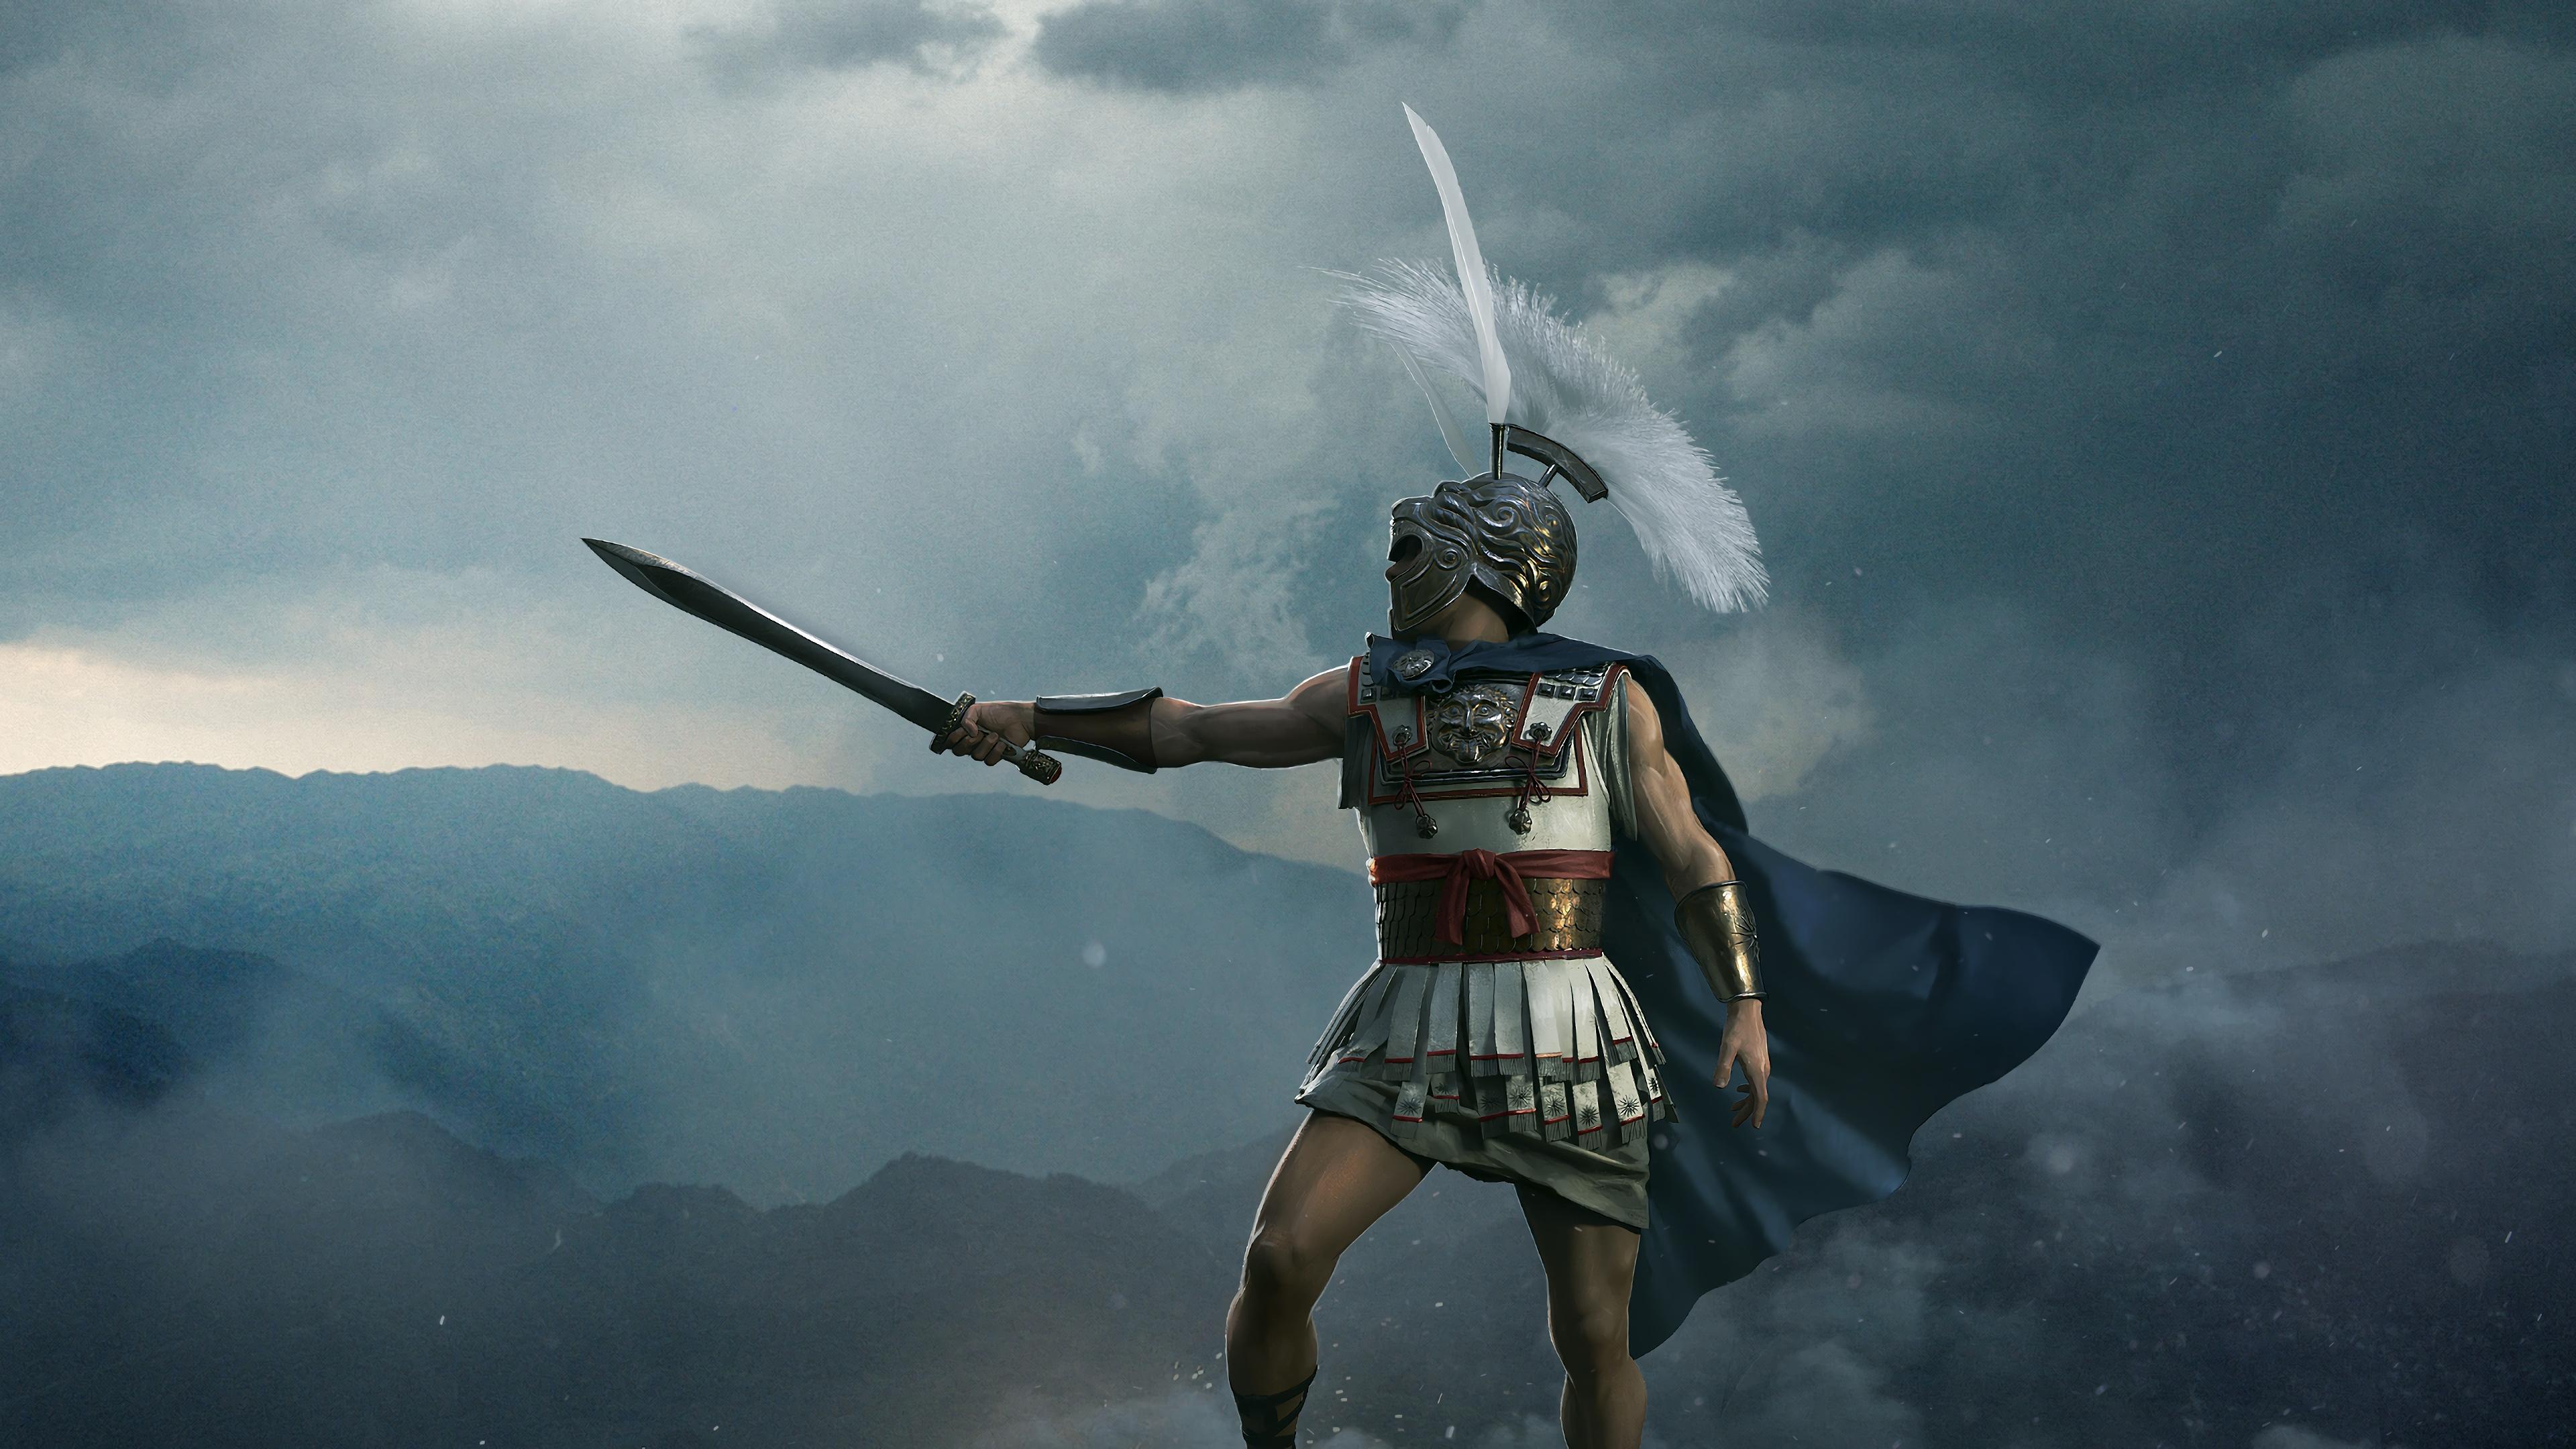 Alexander The Great Wallpaper Hd - HD Wallpaper